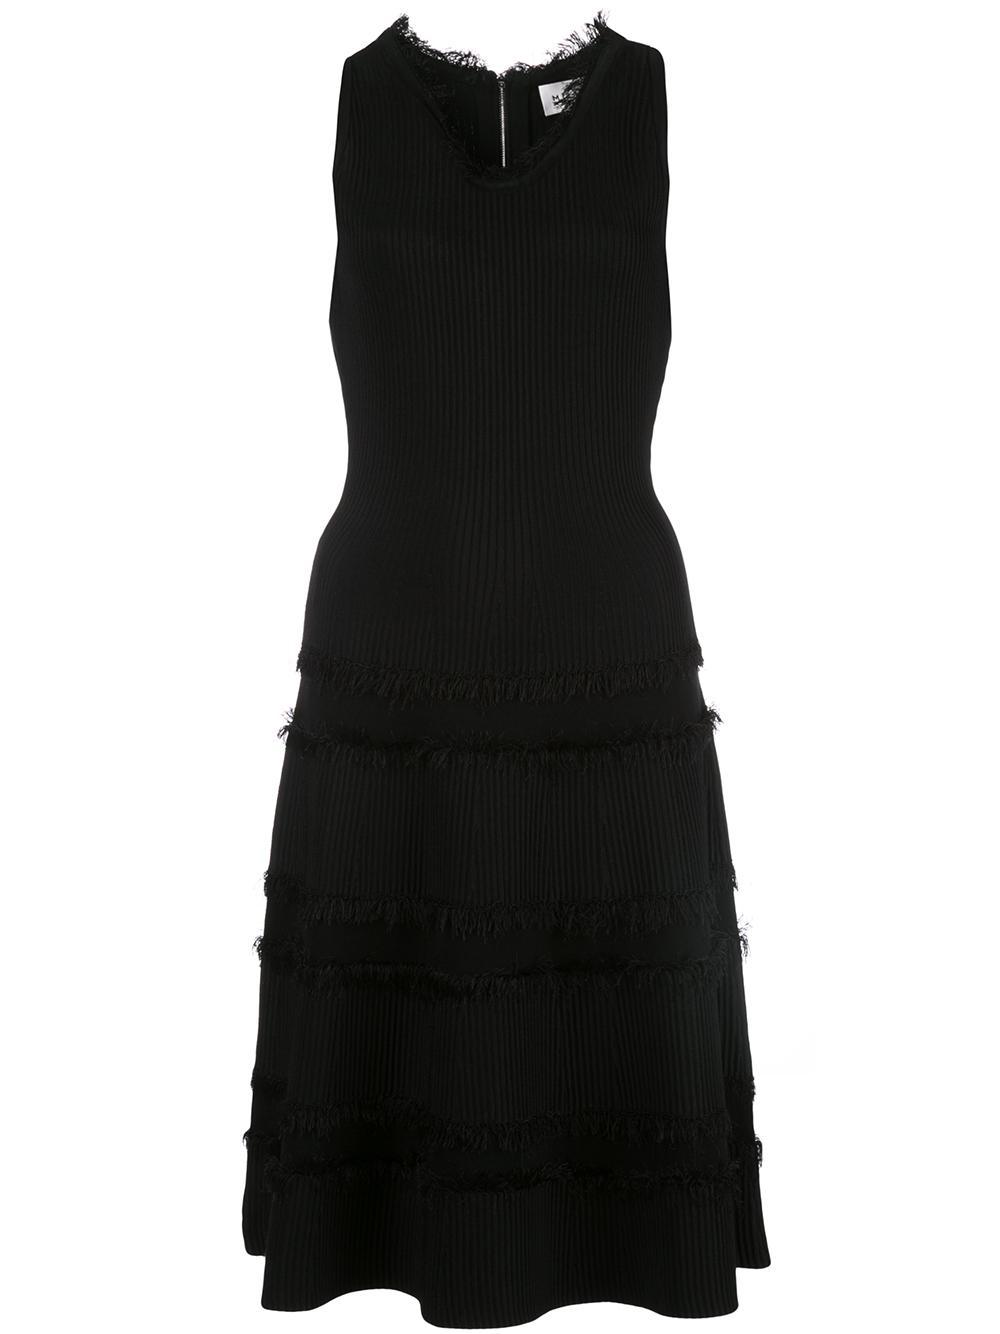 Cut Fringe Fit And Flare Dress Item # 224AK120357